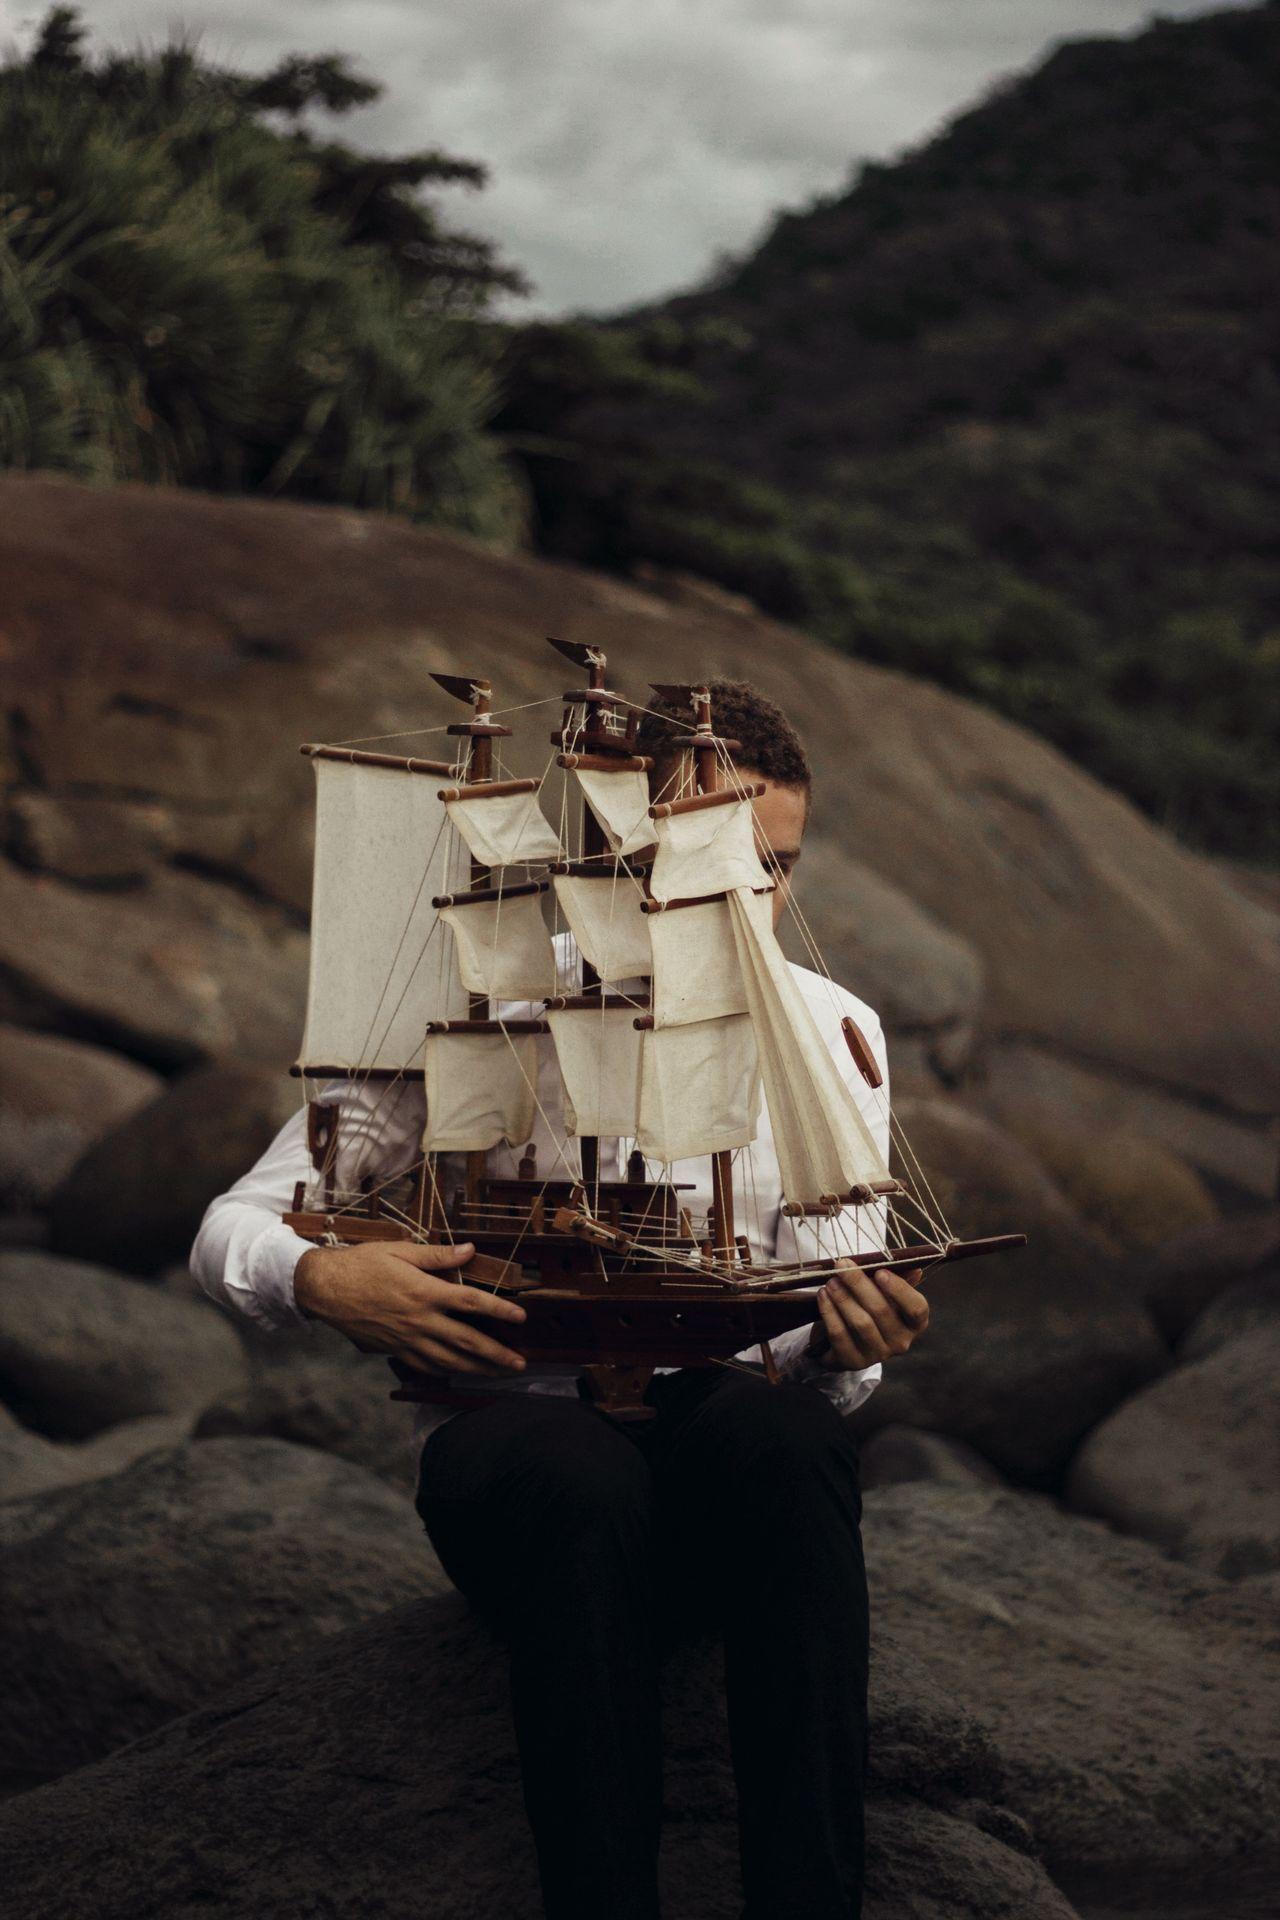 Man holding ship toy on land